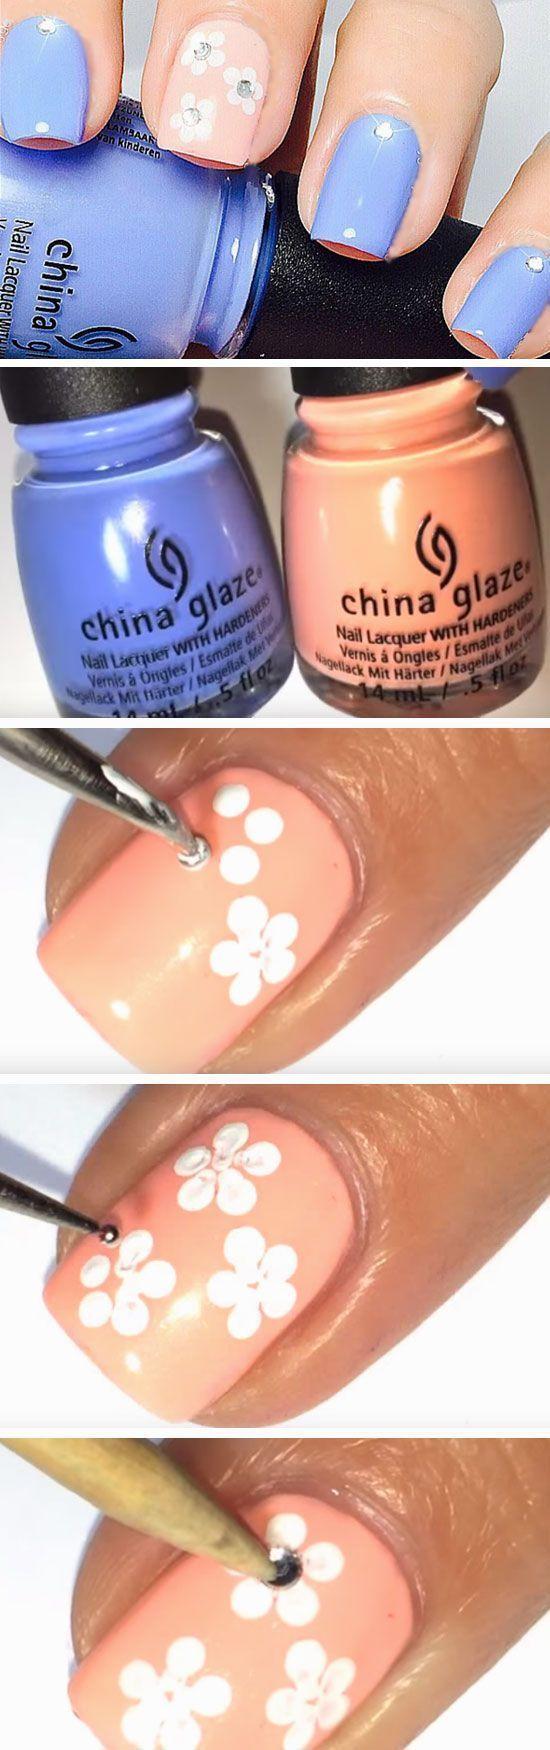 22 Easy Spring Nail Designs For Short Nails Beach Nail Art Teen